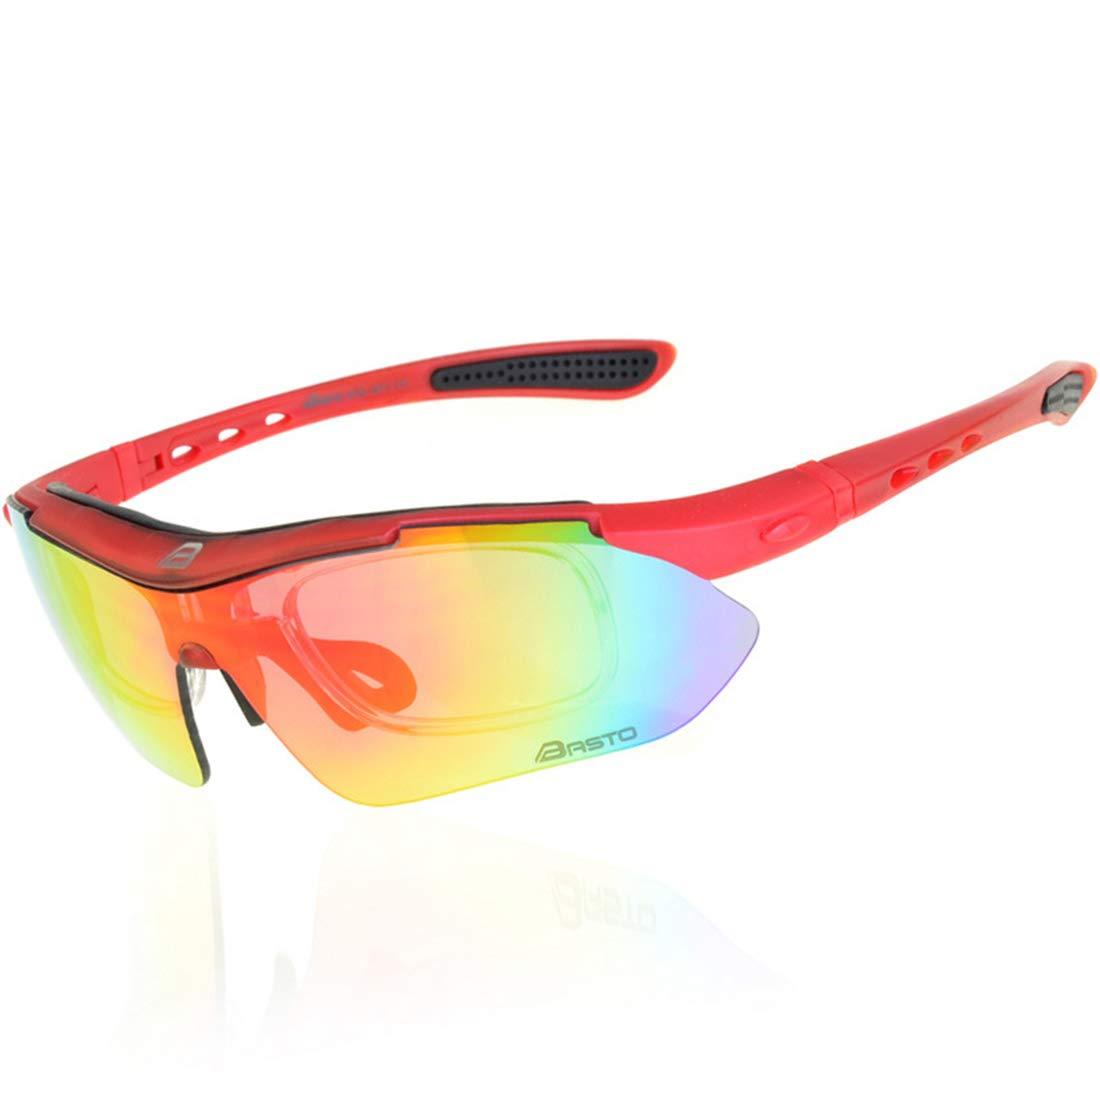 CAFUTY サイクリング用眼鏡自転車用変色メガネ屋外用自転車用屋外用自転車用メガネ (Color : C2)  C2 B07N8VH8D2